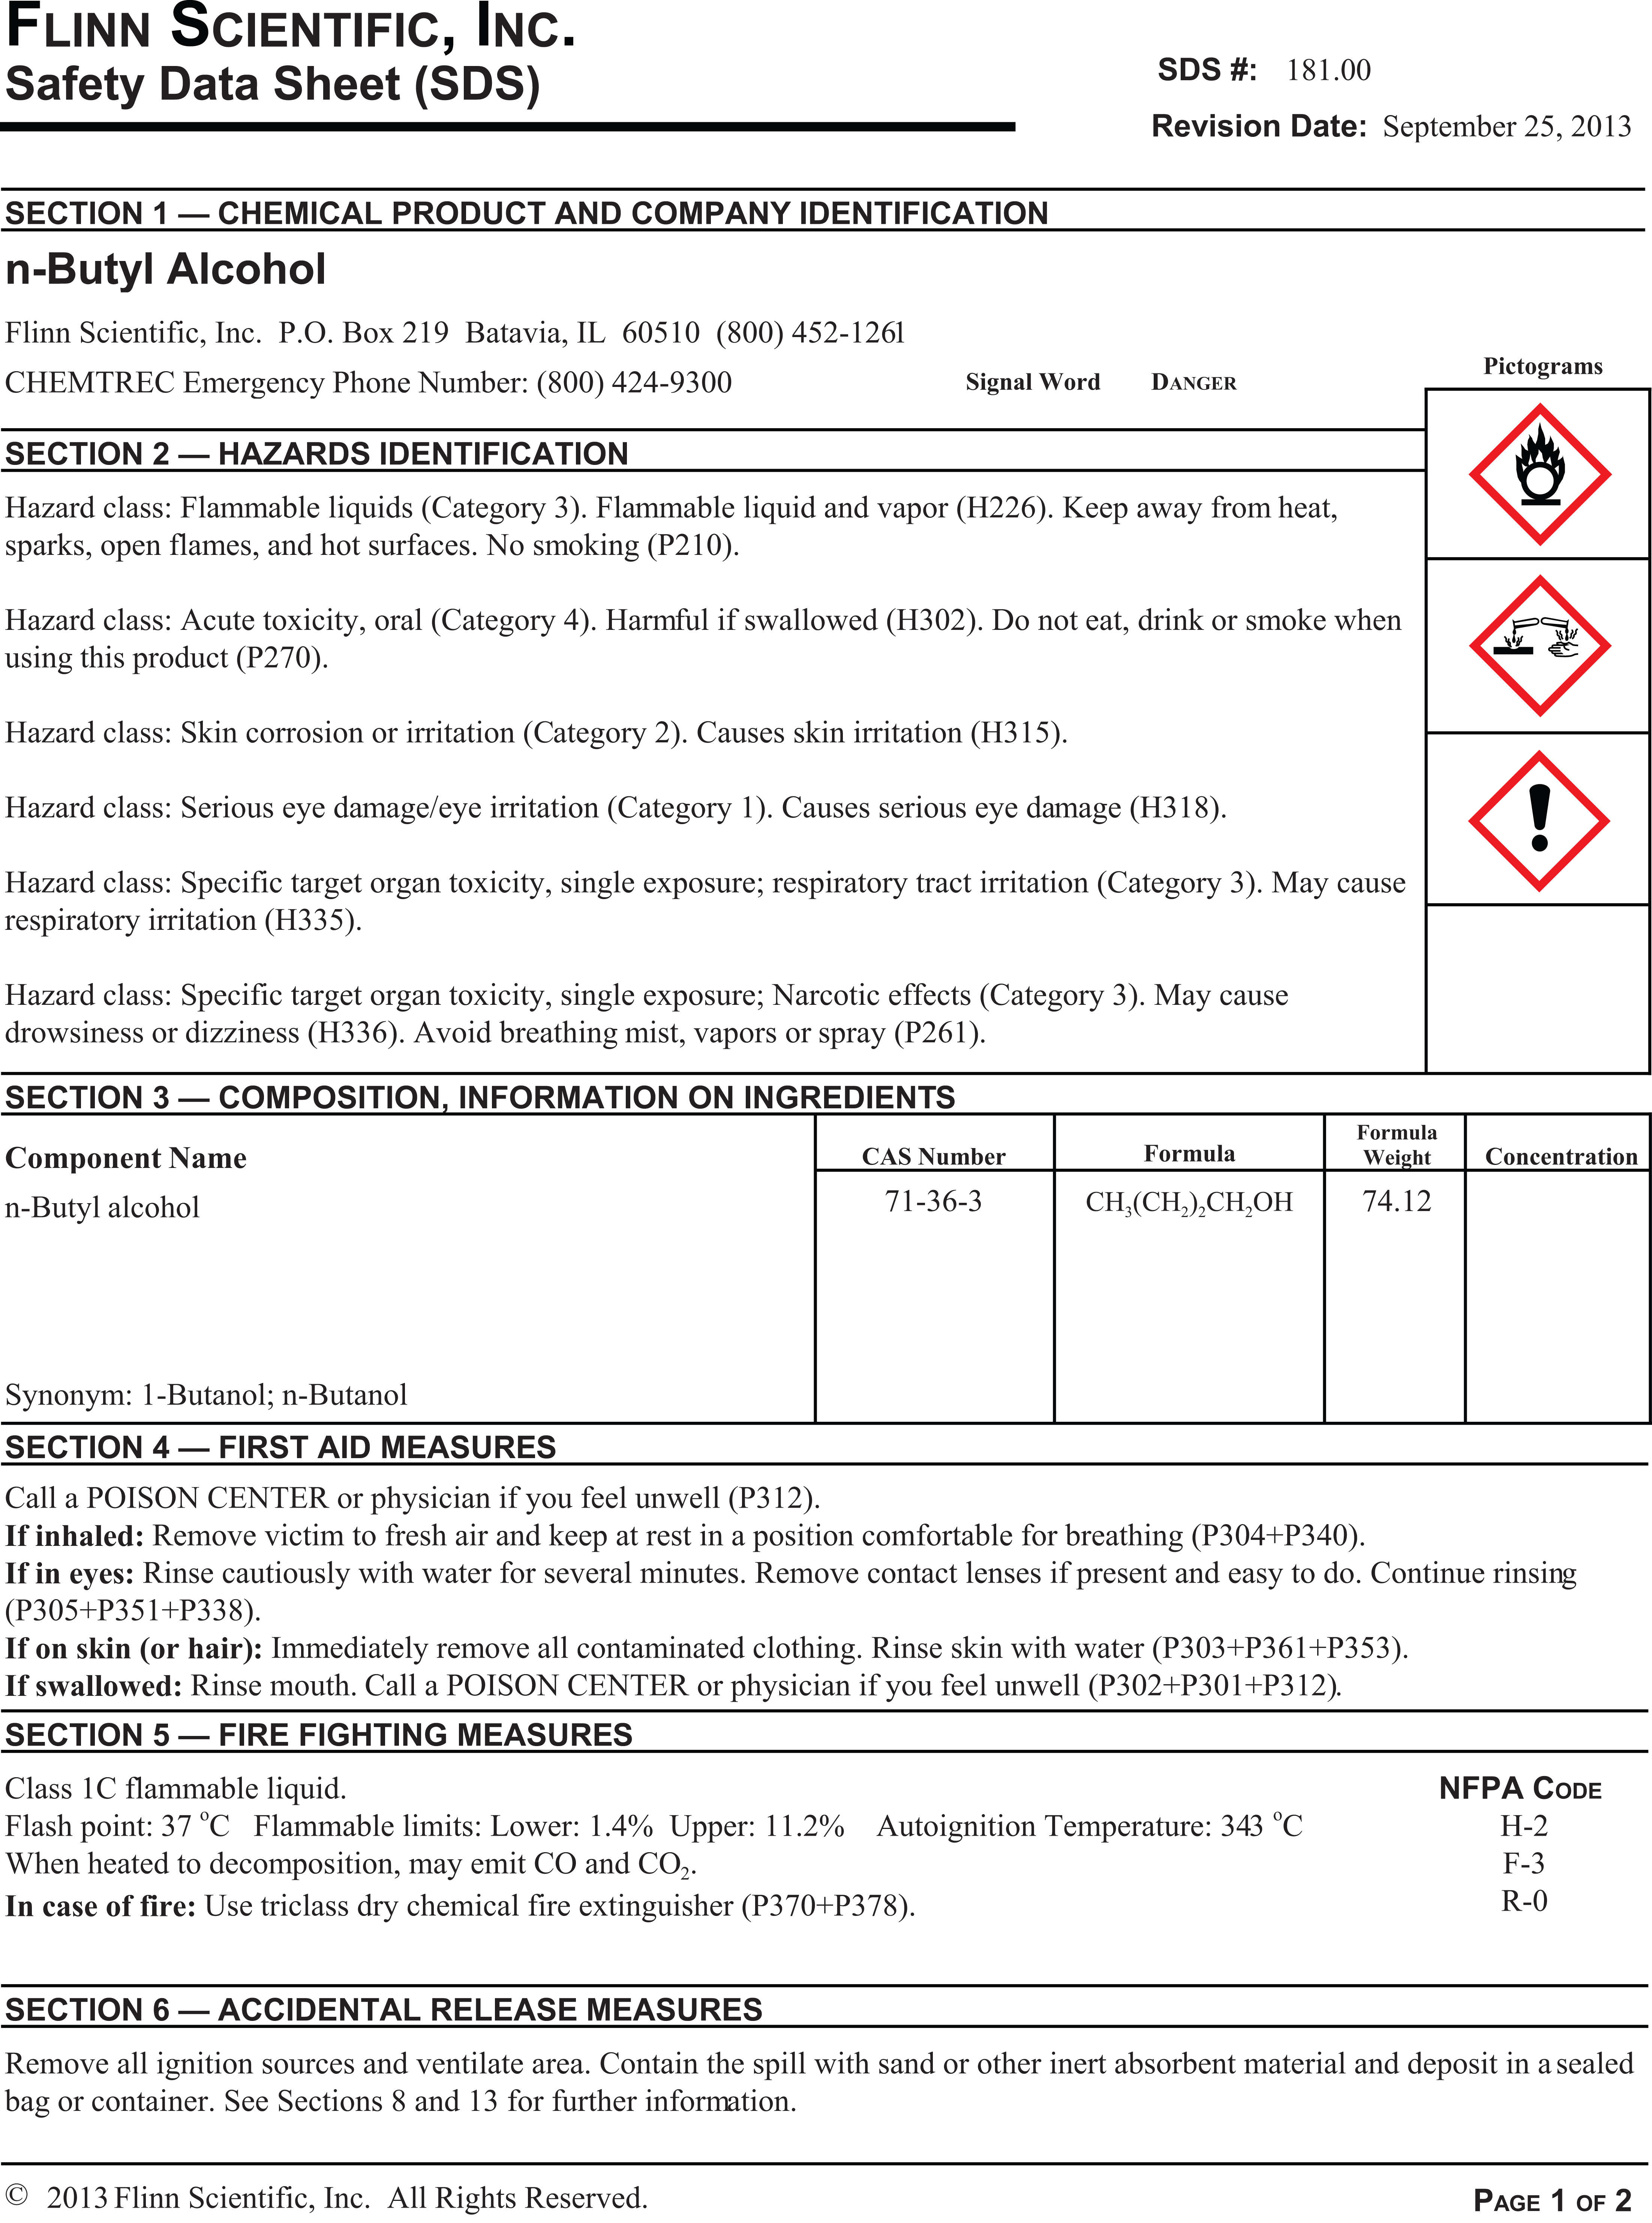 Flinn Safety Data Sheet (SDS) Library